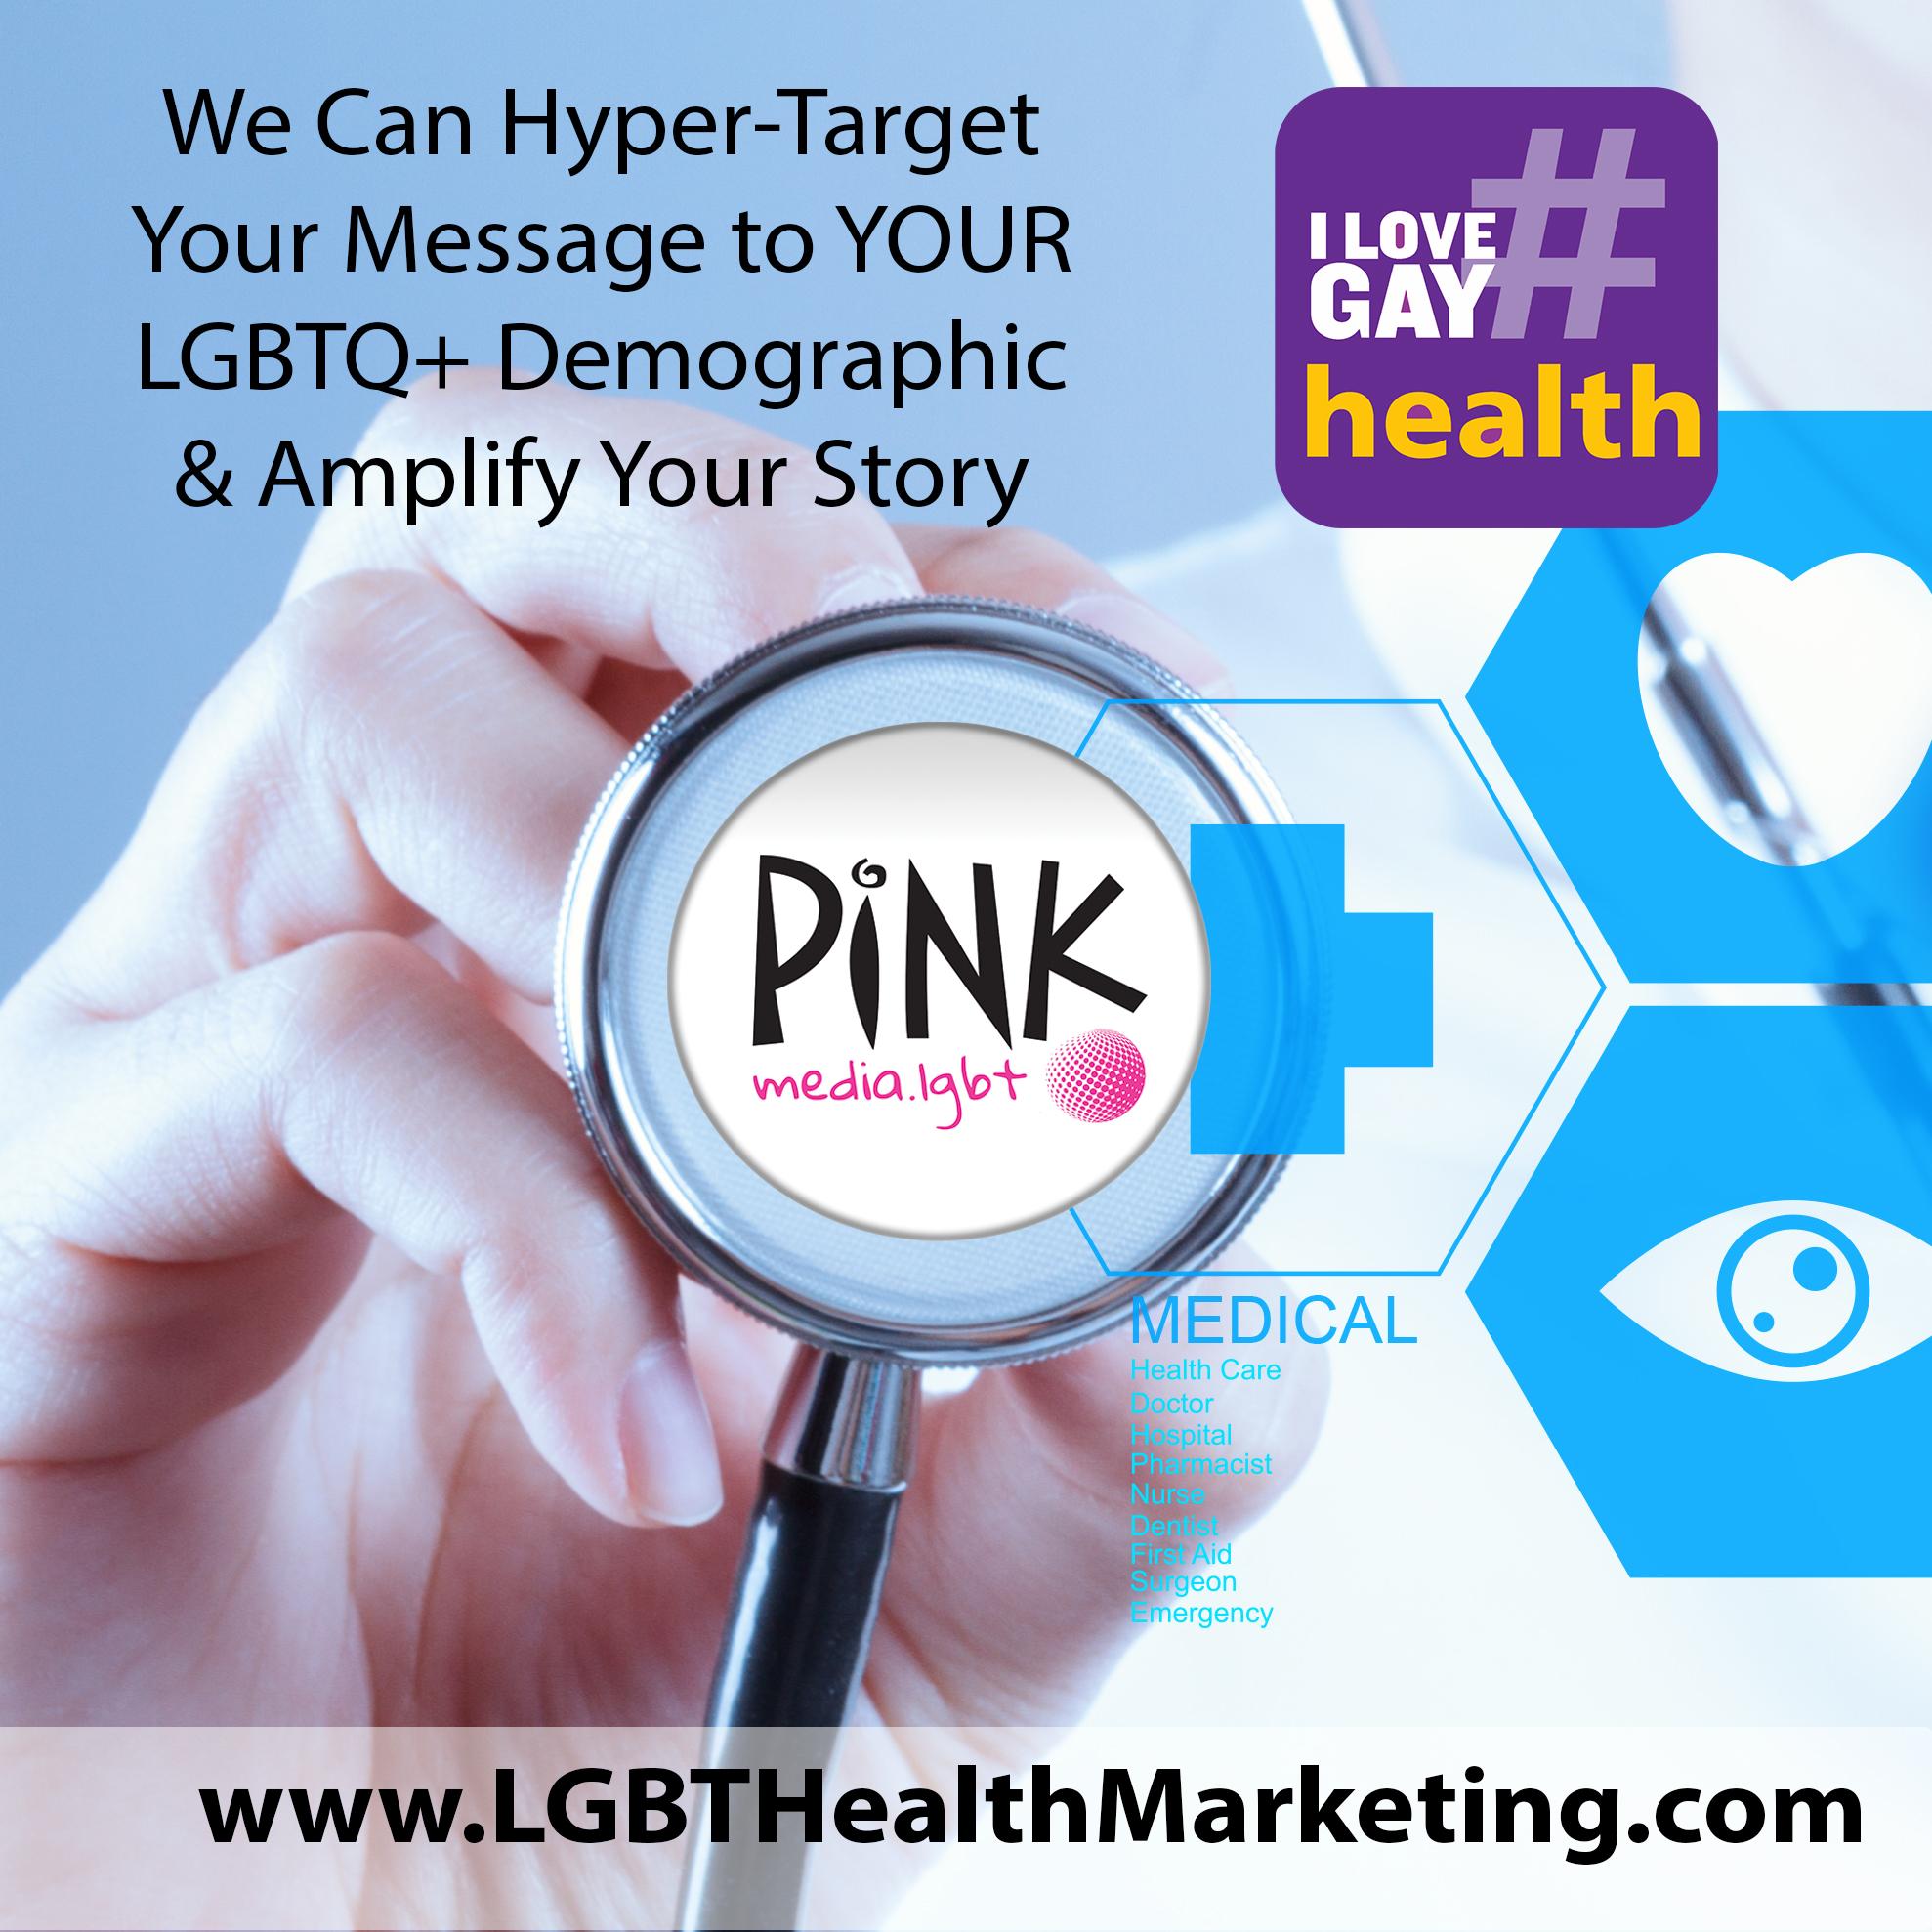 LGBTHealthMarketing.com